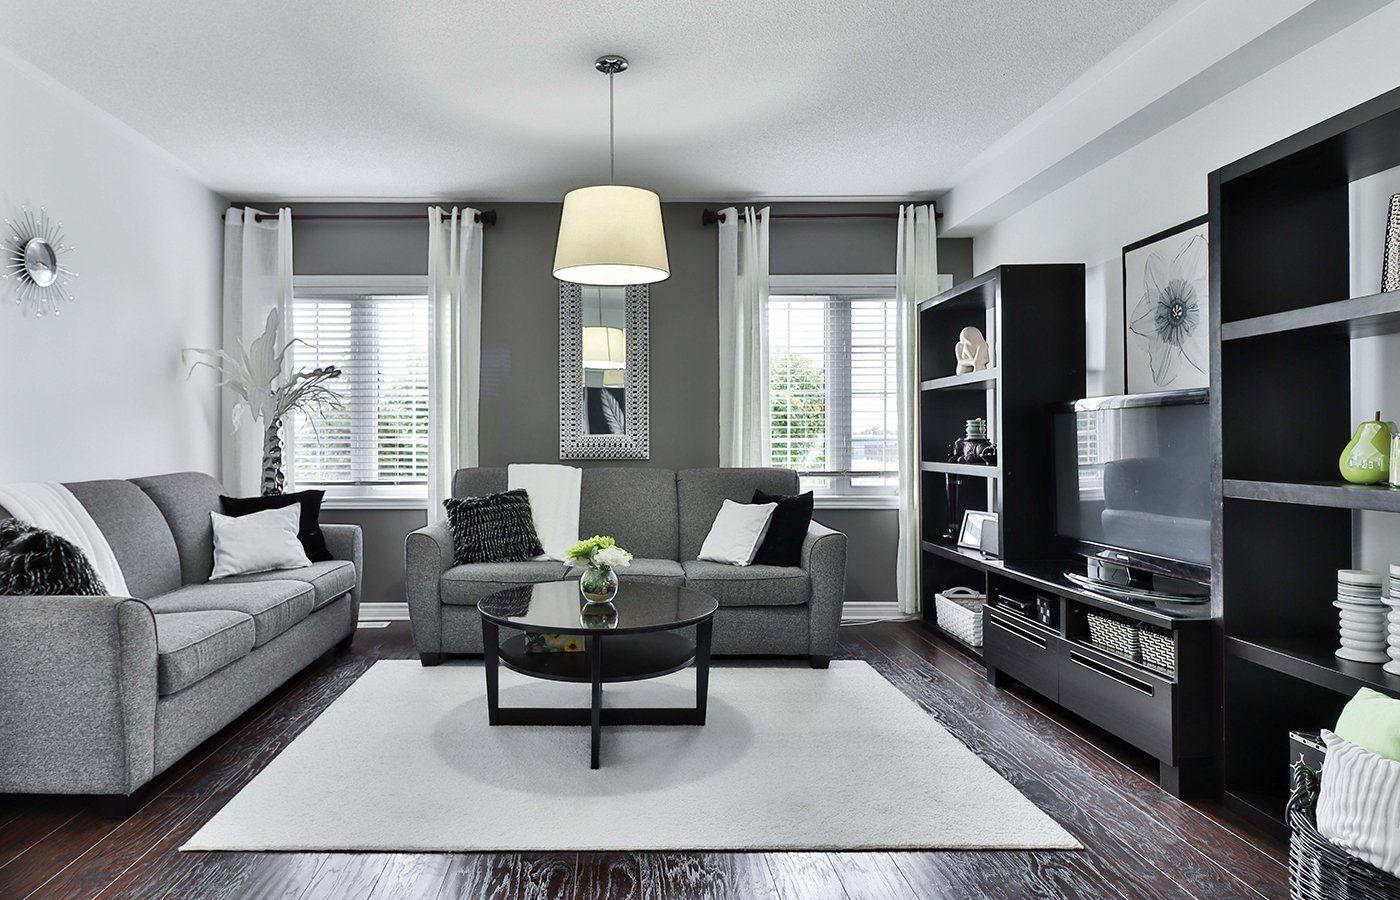 Beautiful modern monochrome home interior